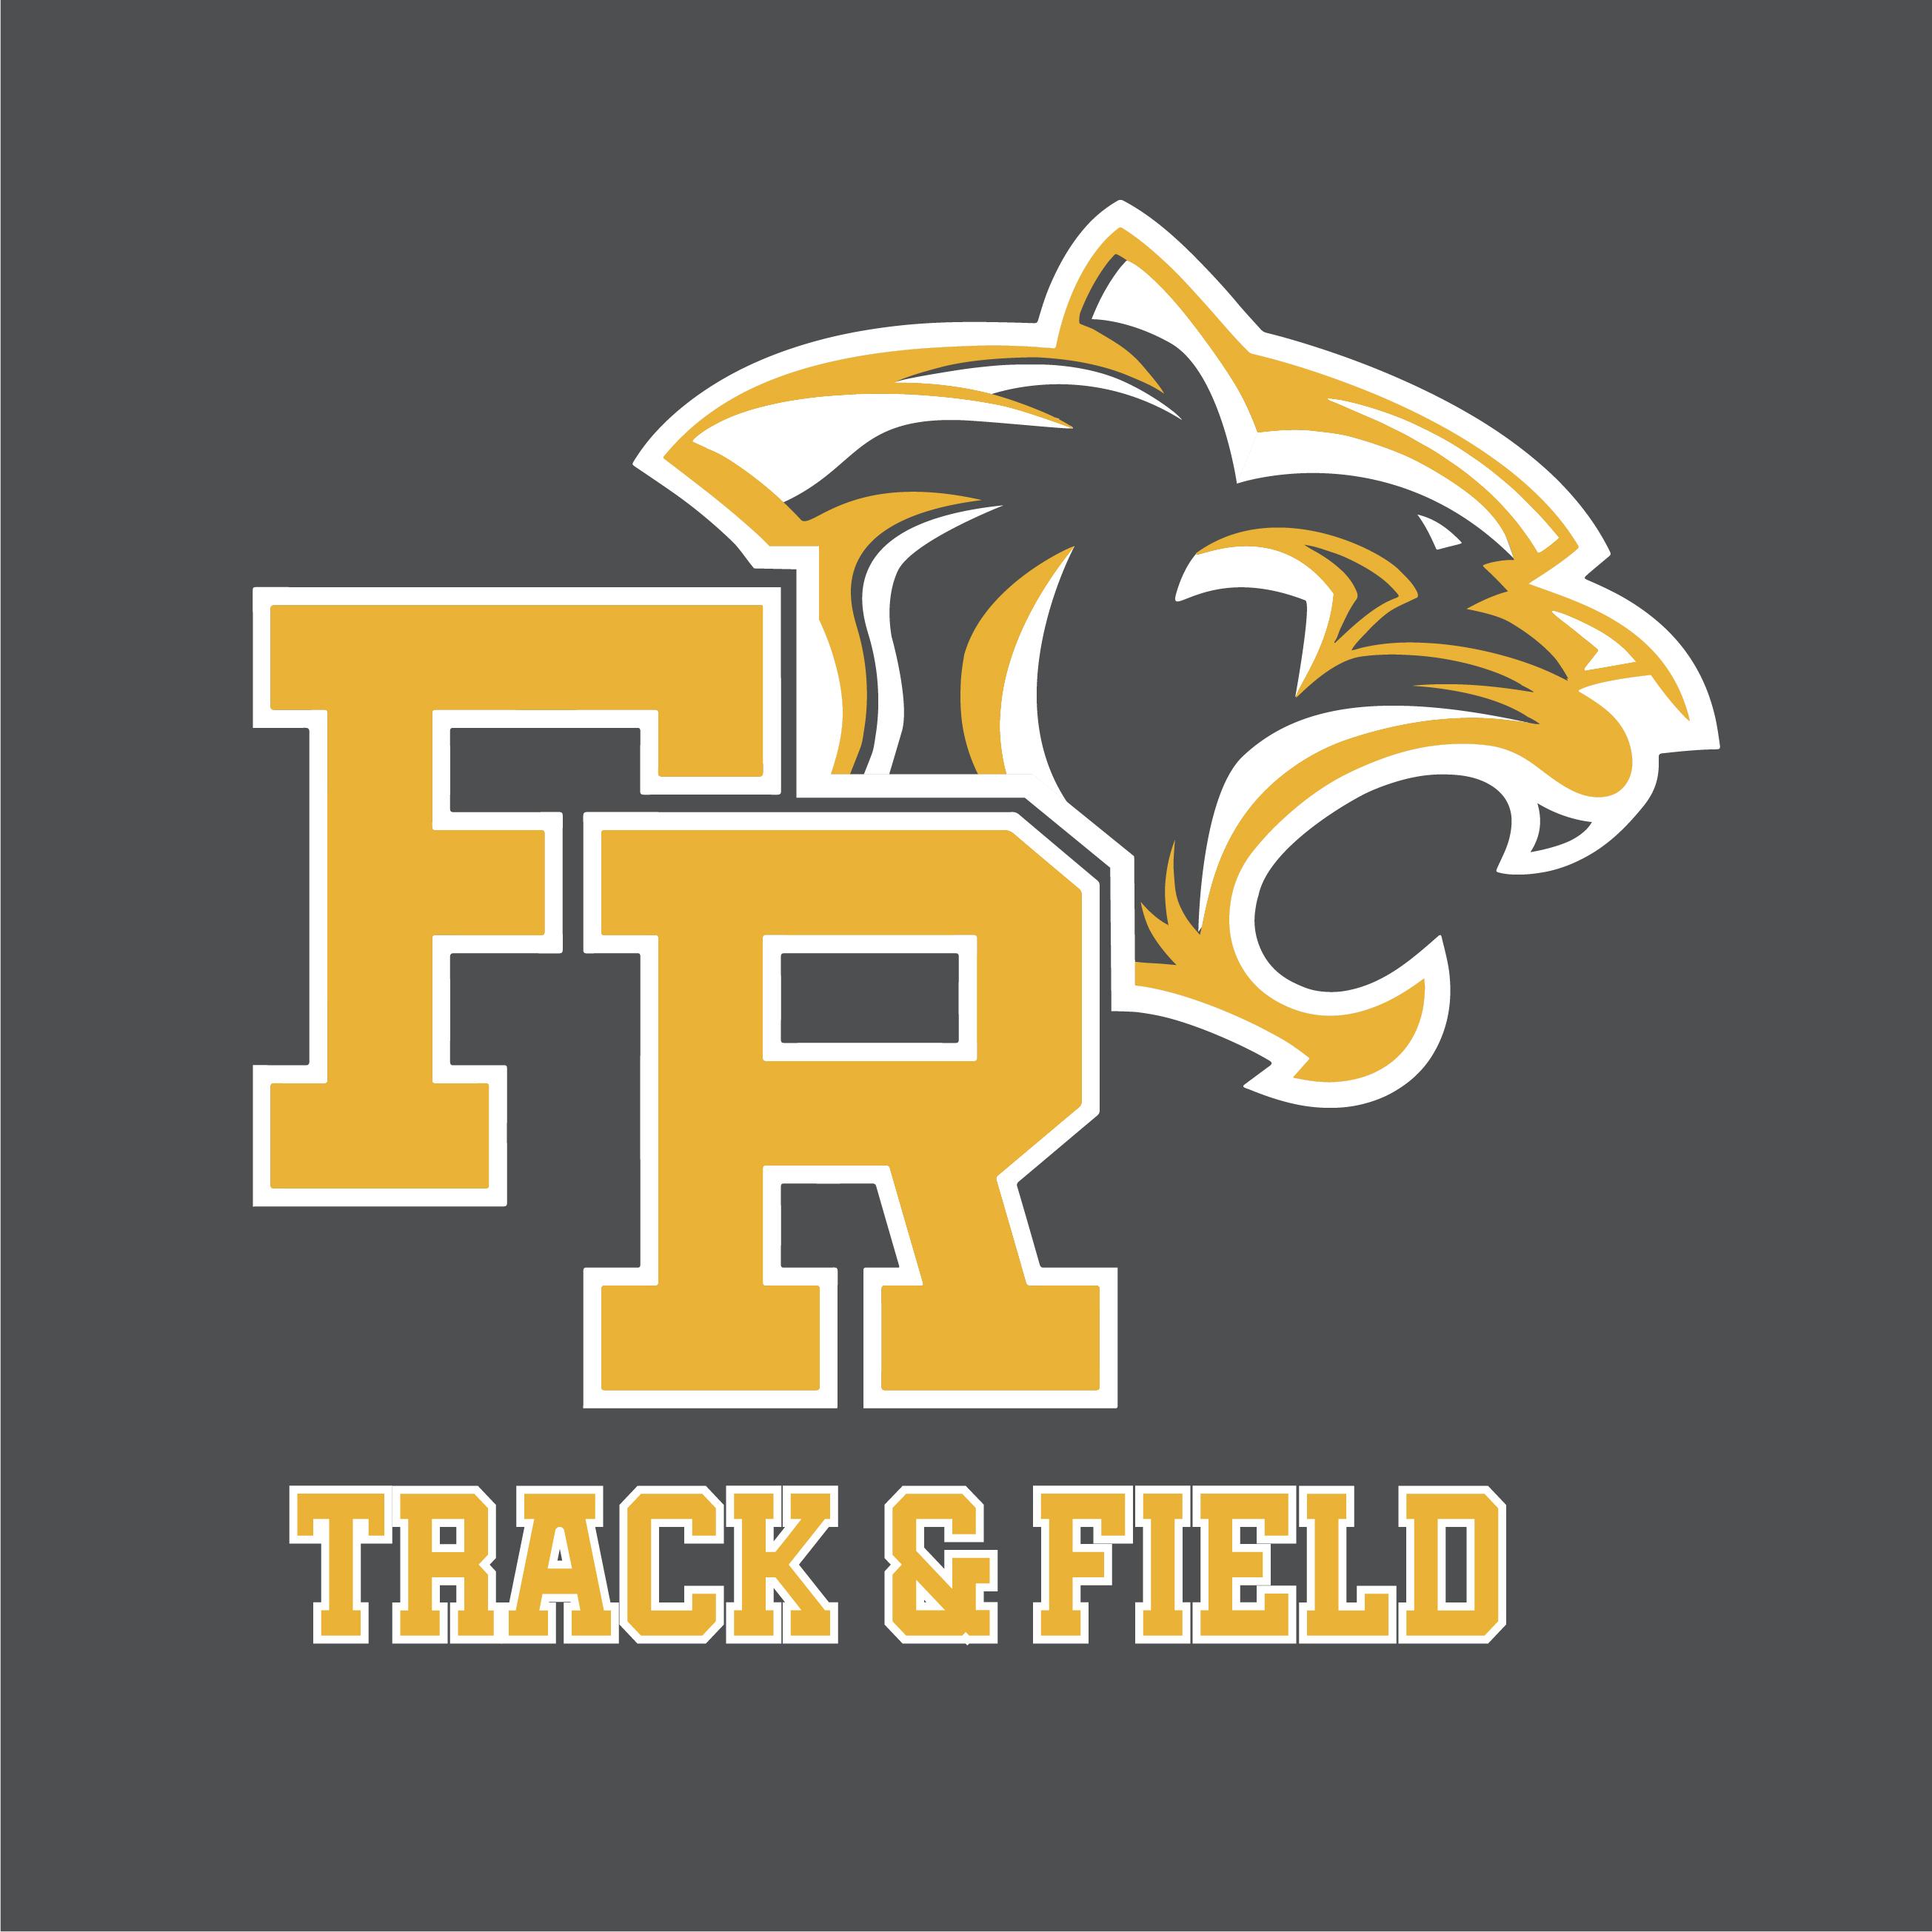 FR Track & Field